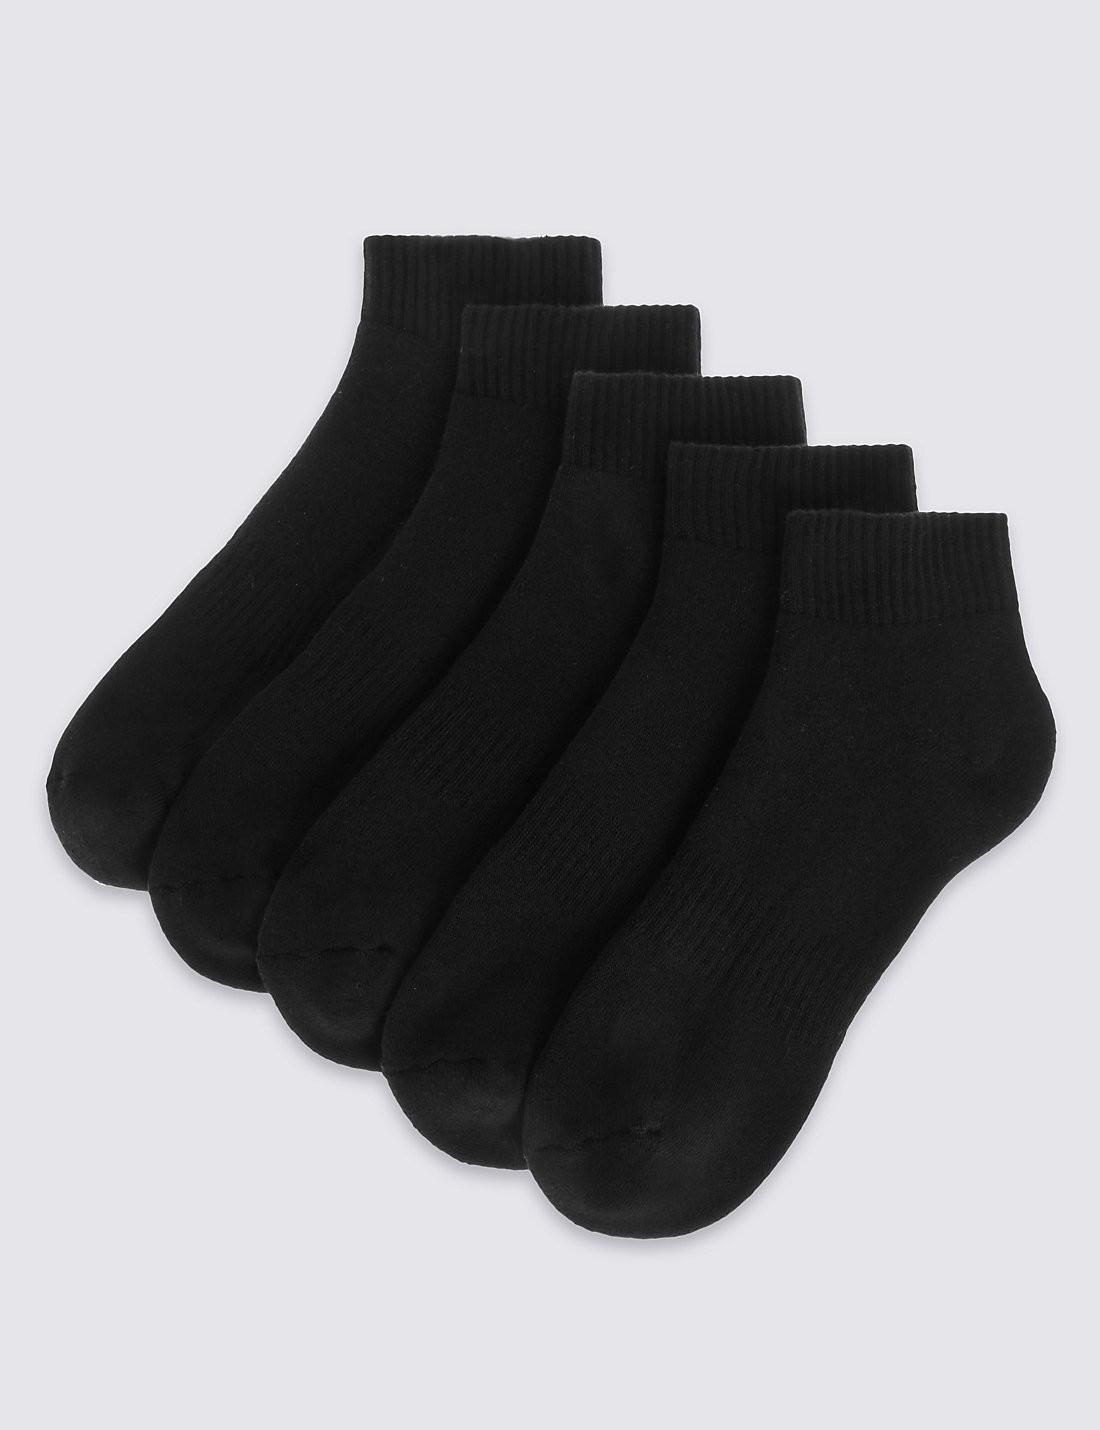 5'li Çorap (Cool & Freshfeet™ Teknolojisi ile)